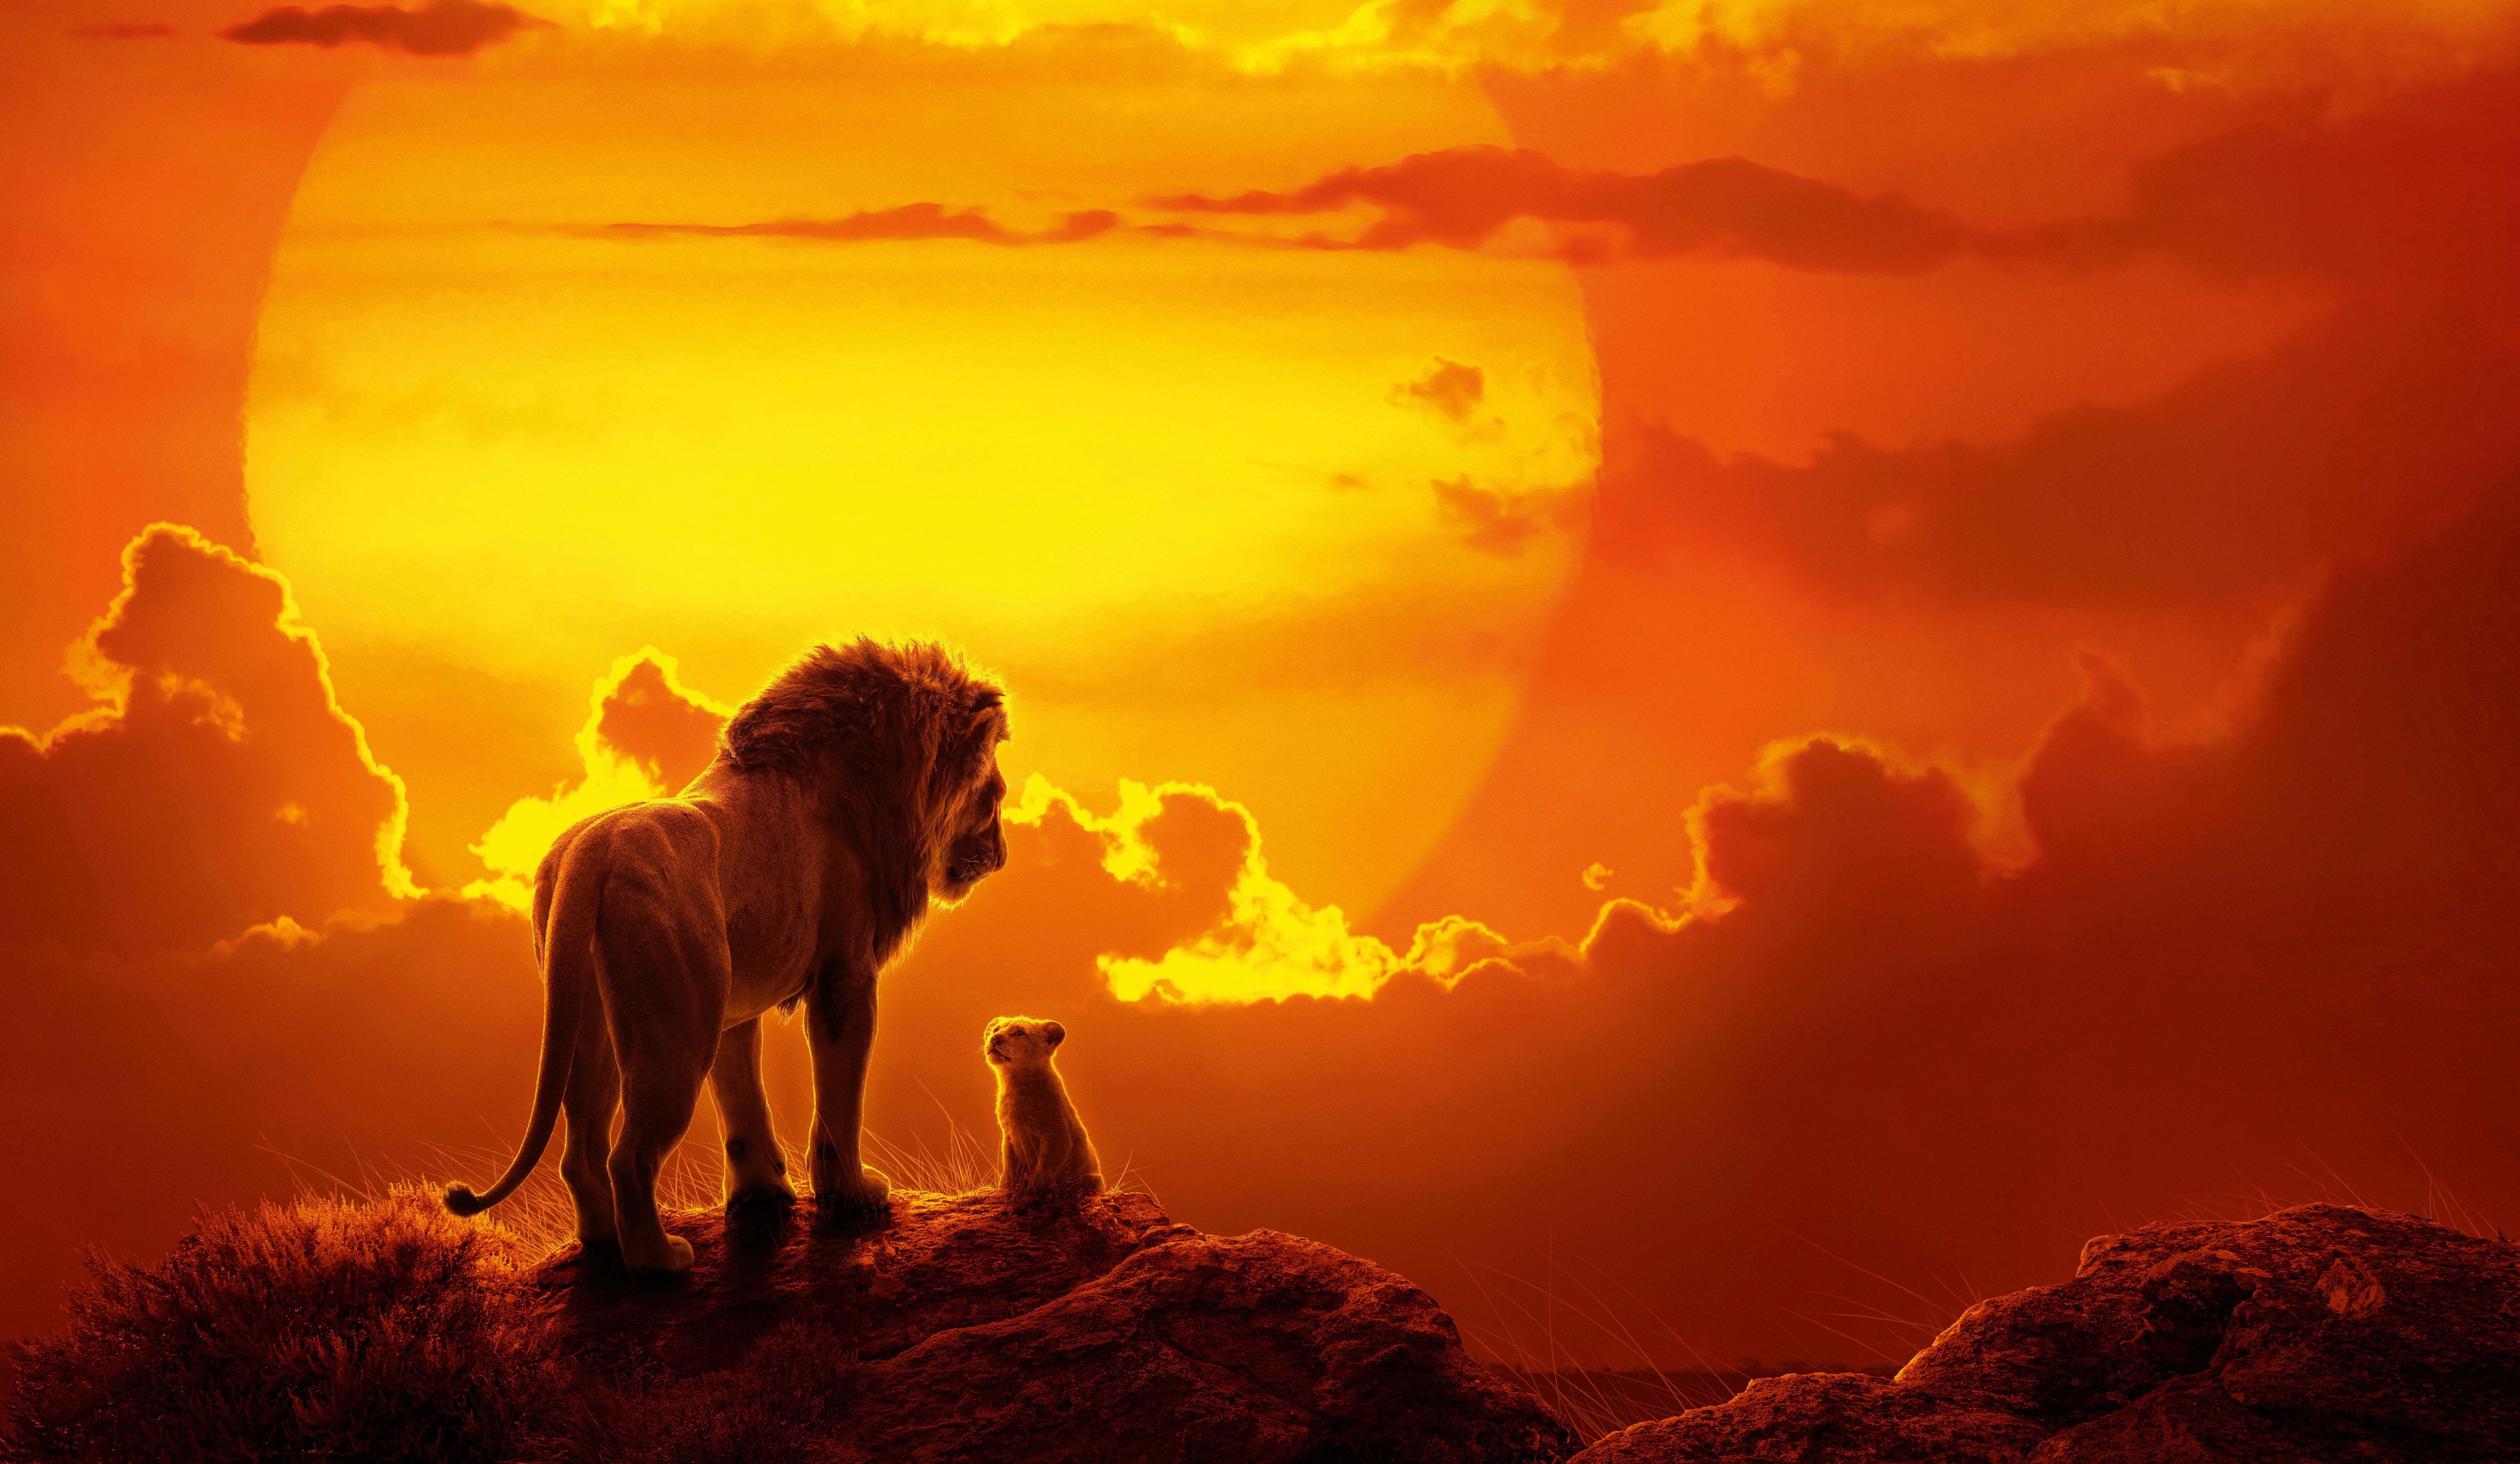 Lion King Sunset 3840x2160 In 2020 Lion Wallpaper Disney Desktop Wallpaper Wallpaper Iphone Disney Princess